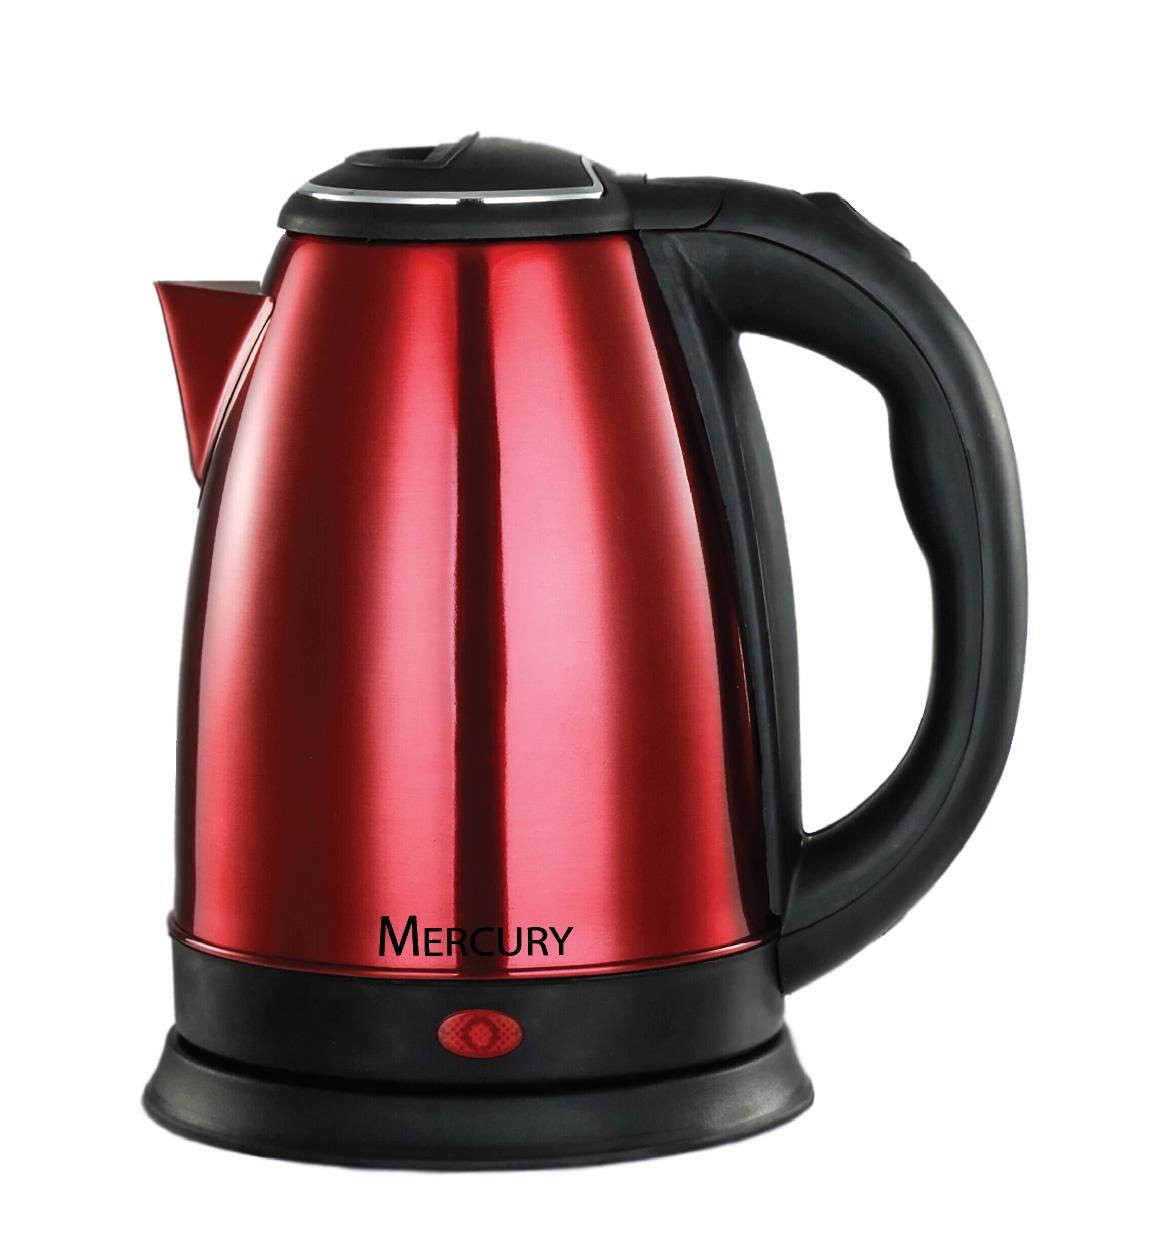 Электрический чайник Mercury Haus MC-6623, красный электрический чайник mercury haus mercury mc 6621